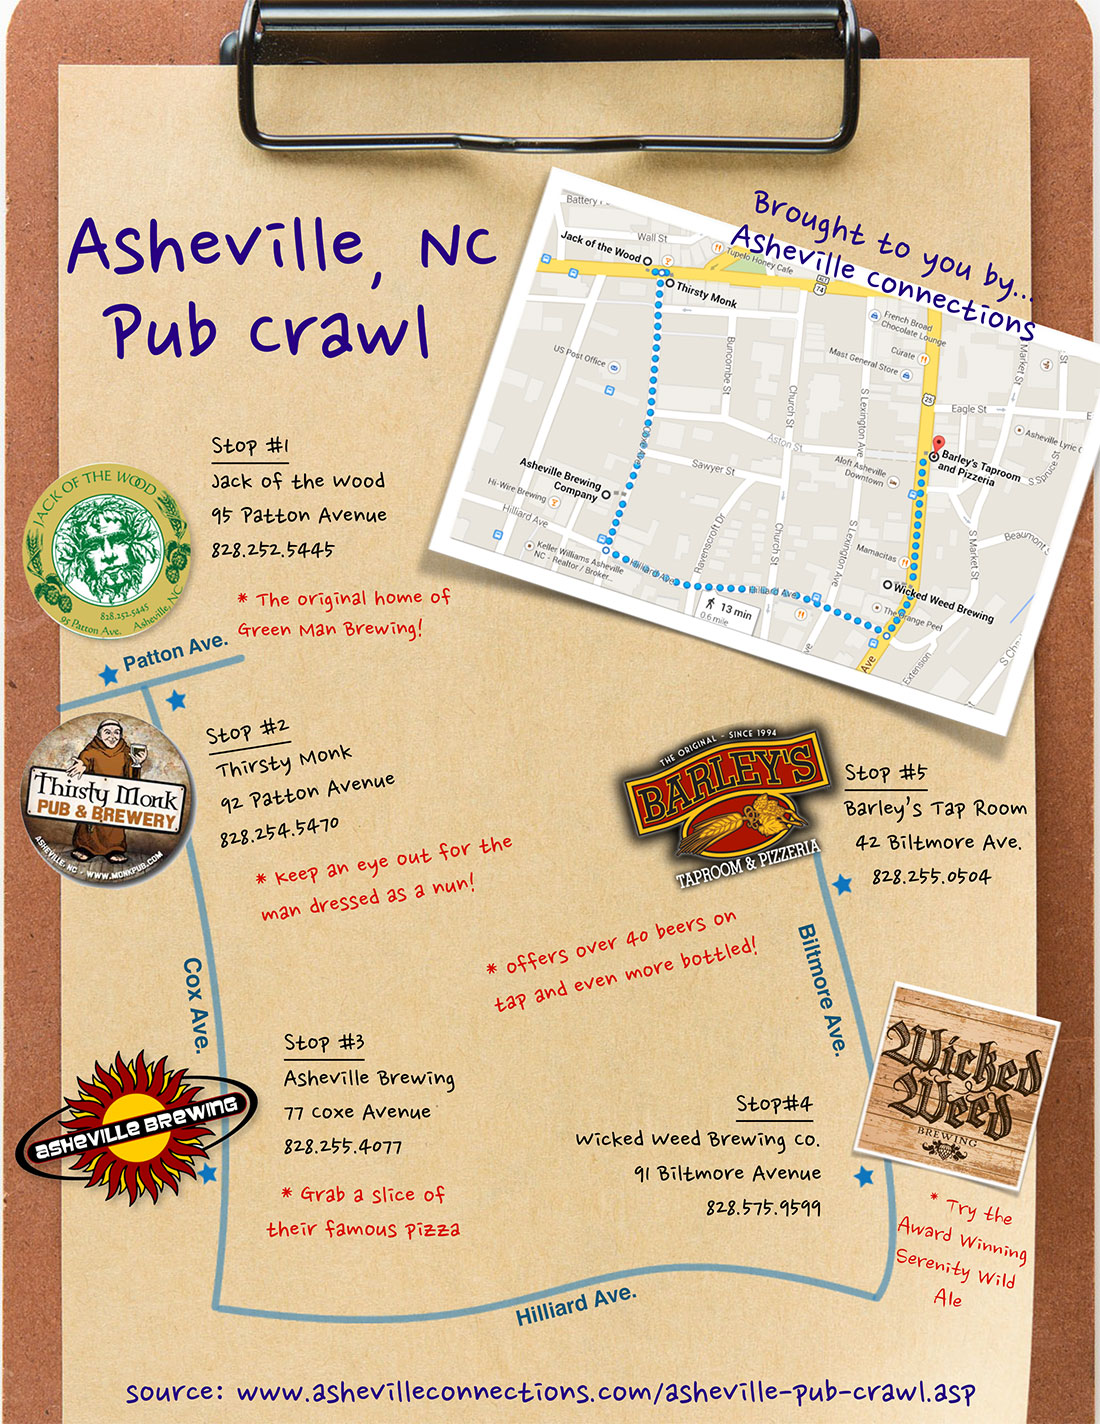 Asheville Pub Crawl